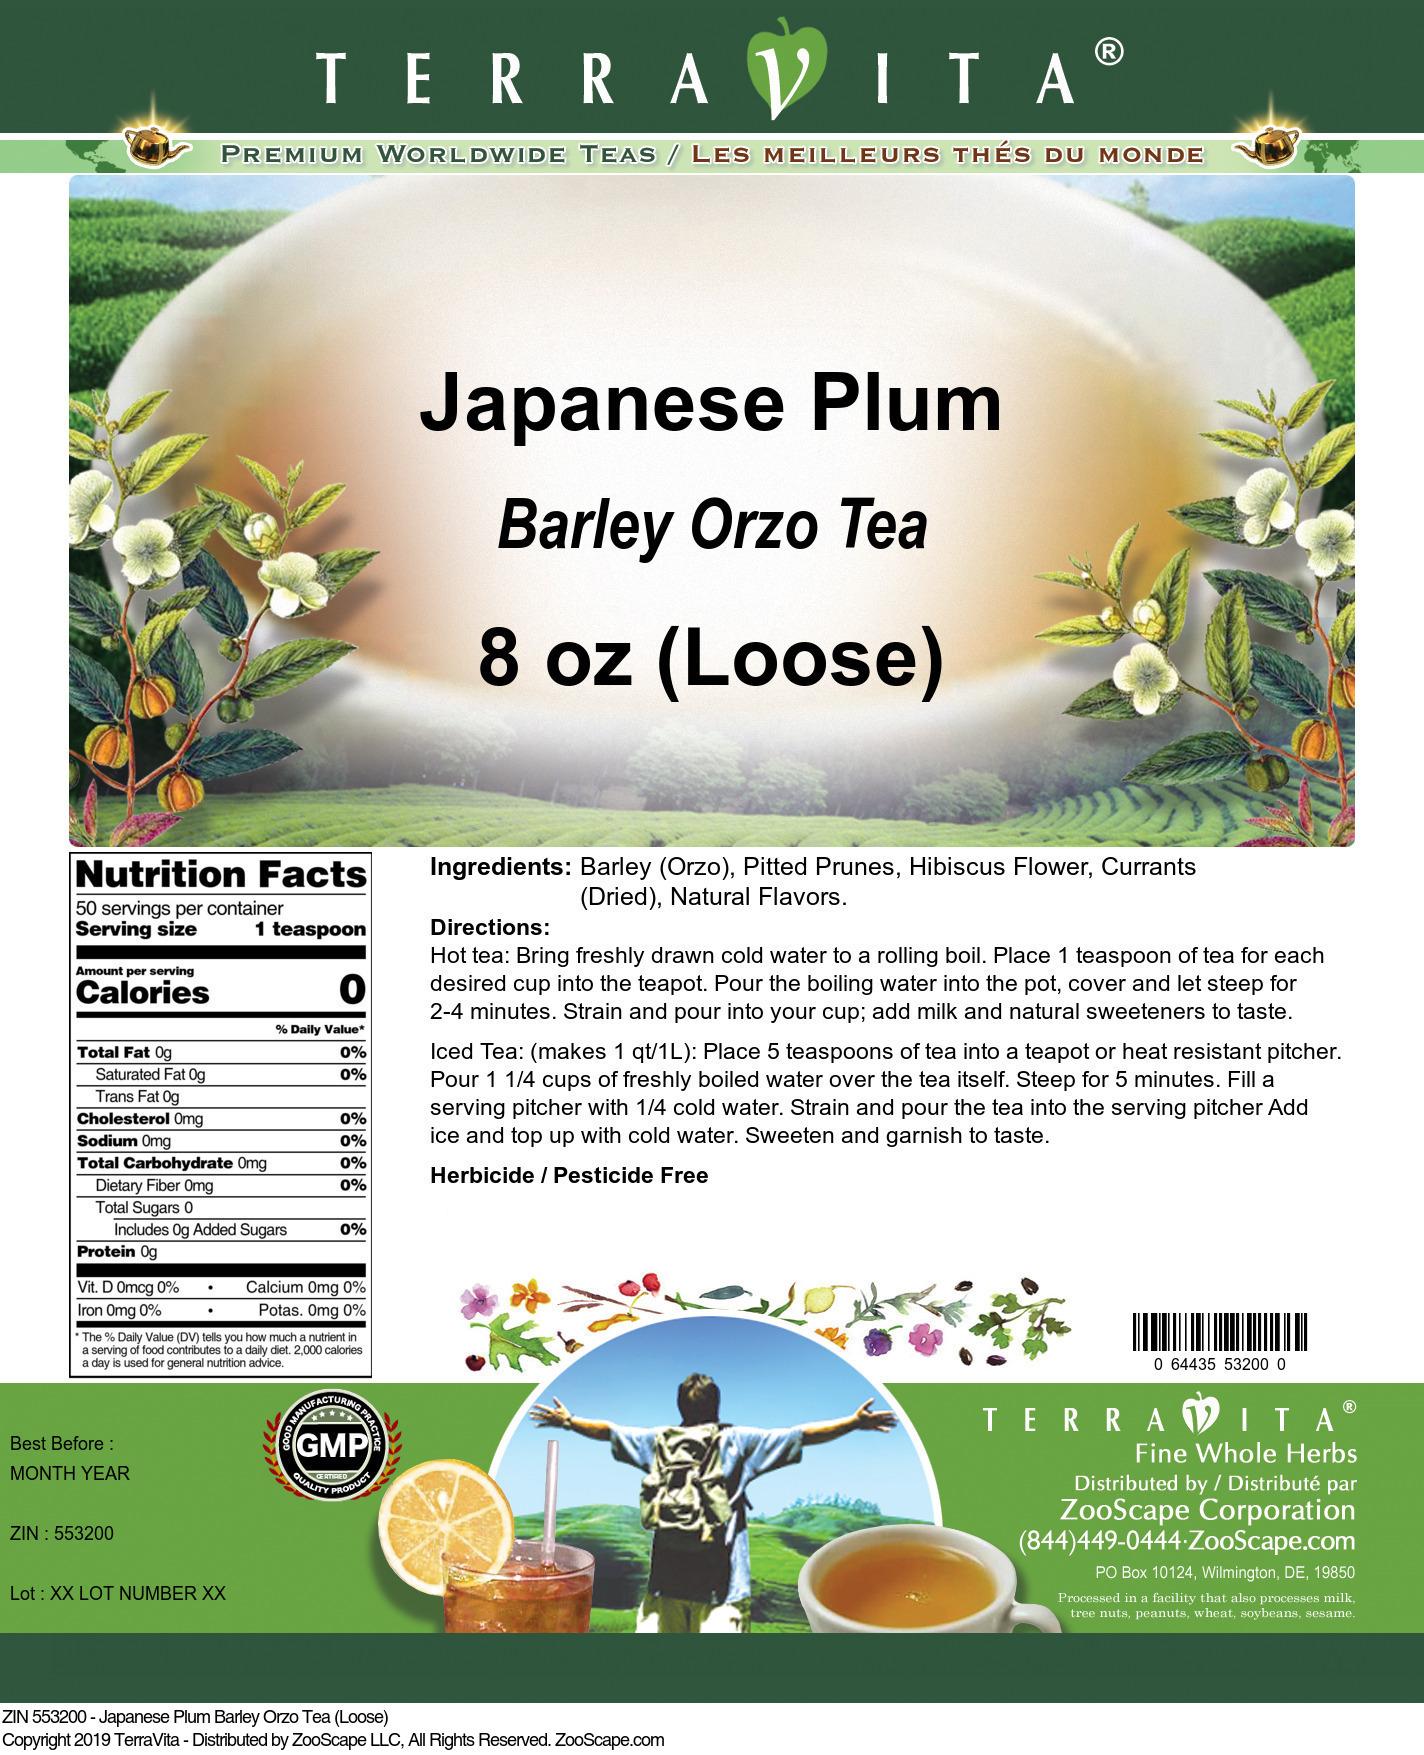 Japanese Plum Barley Orzo Tea (Loose)